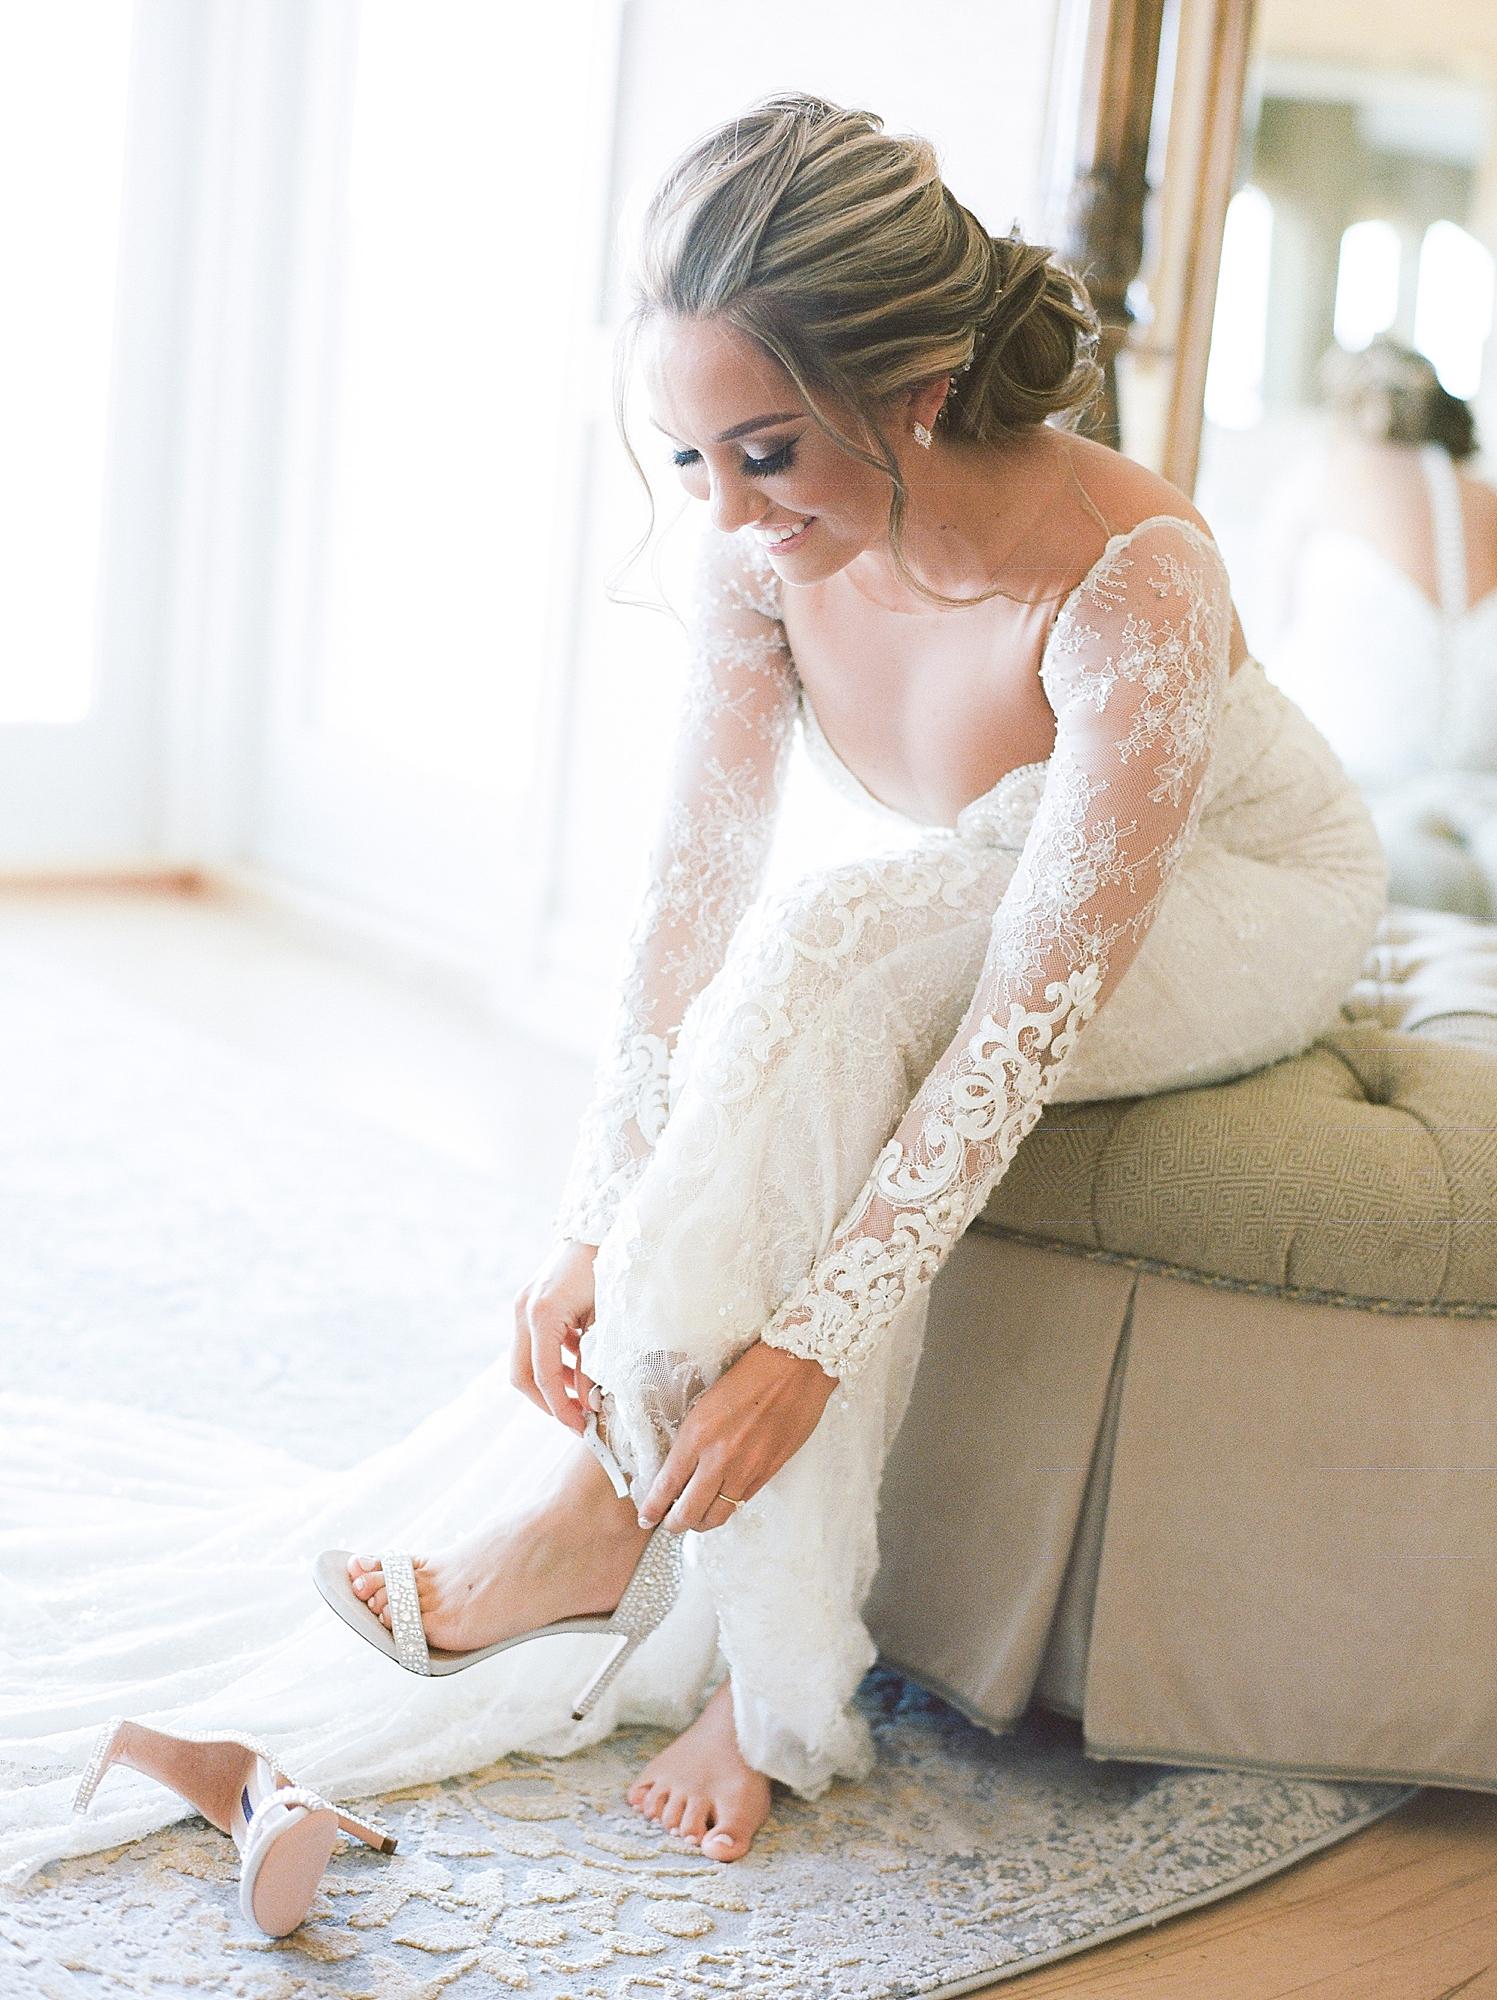 Bonnet Island Estate Film Wedding Photography by Magdalena Studios 0016